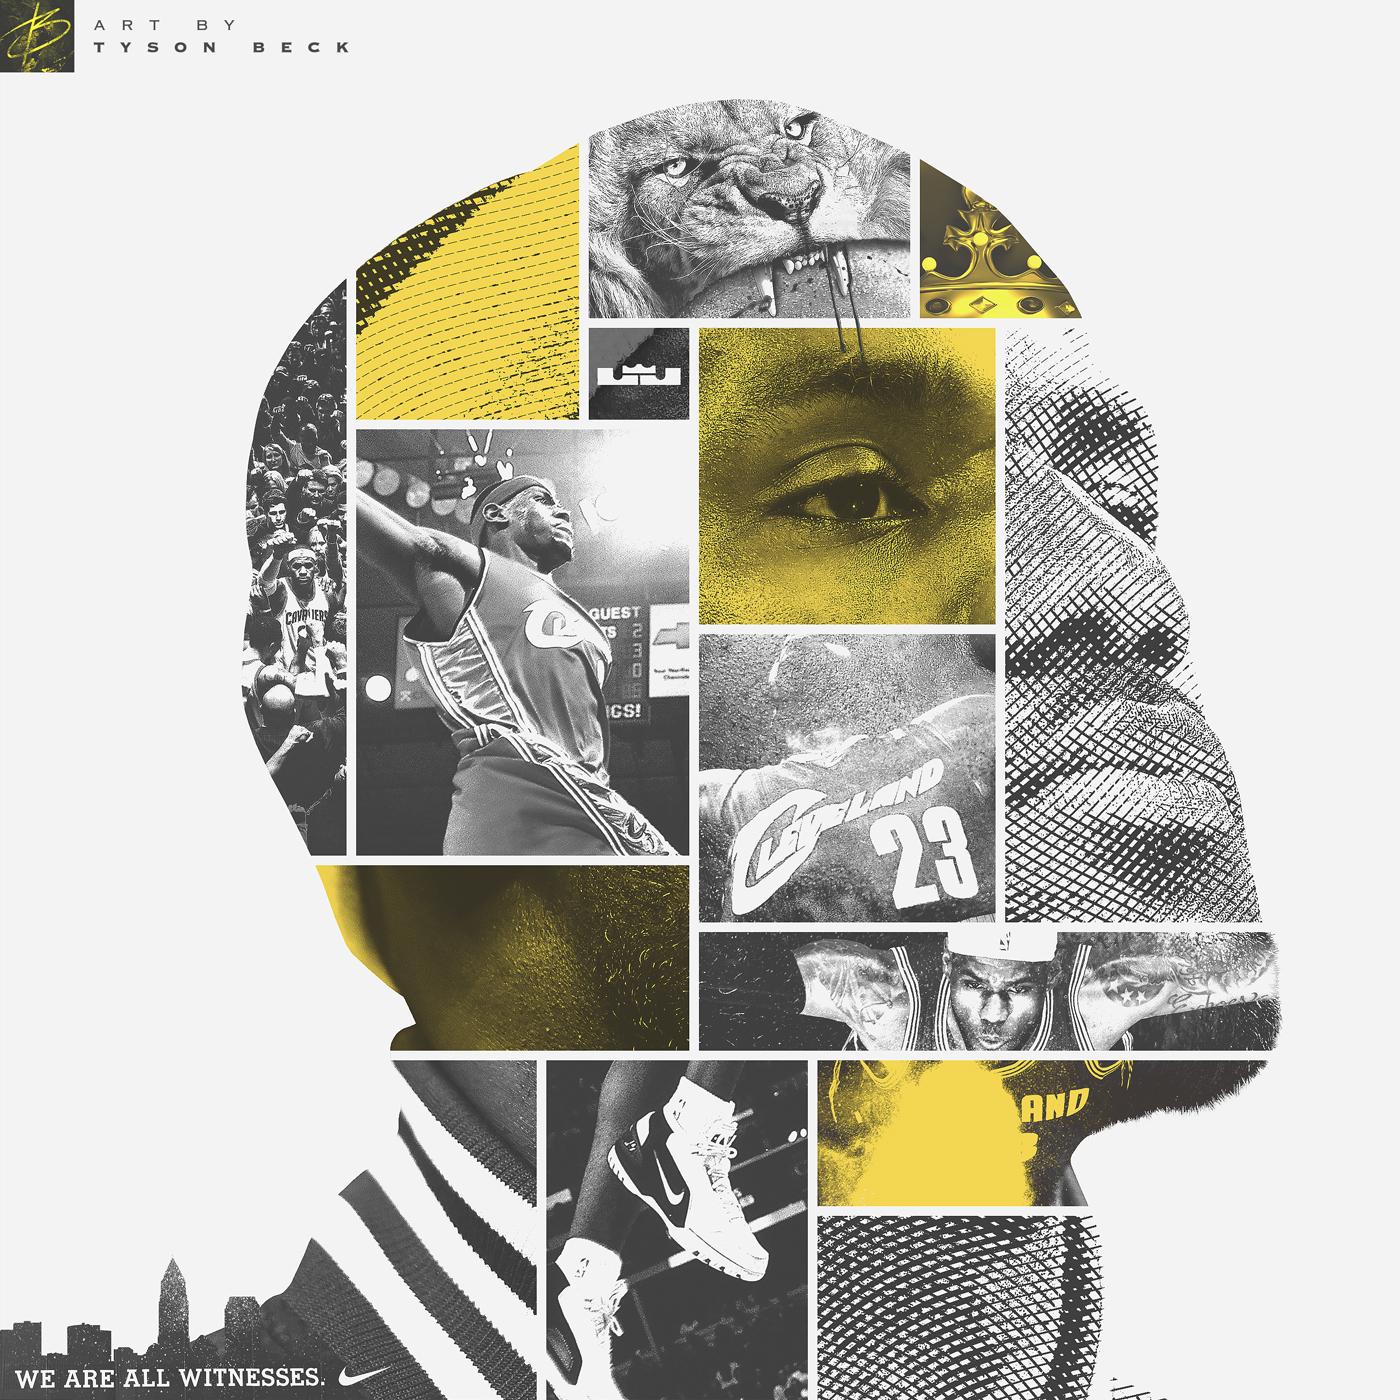 LeBron james Face of Cleveland artwork basketball sport Nike NBA king james Tyson Beck art Dgitial